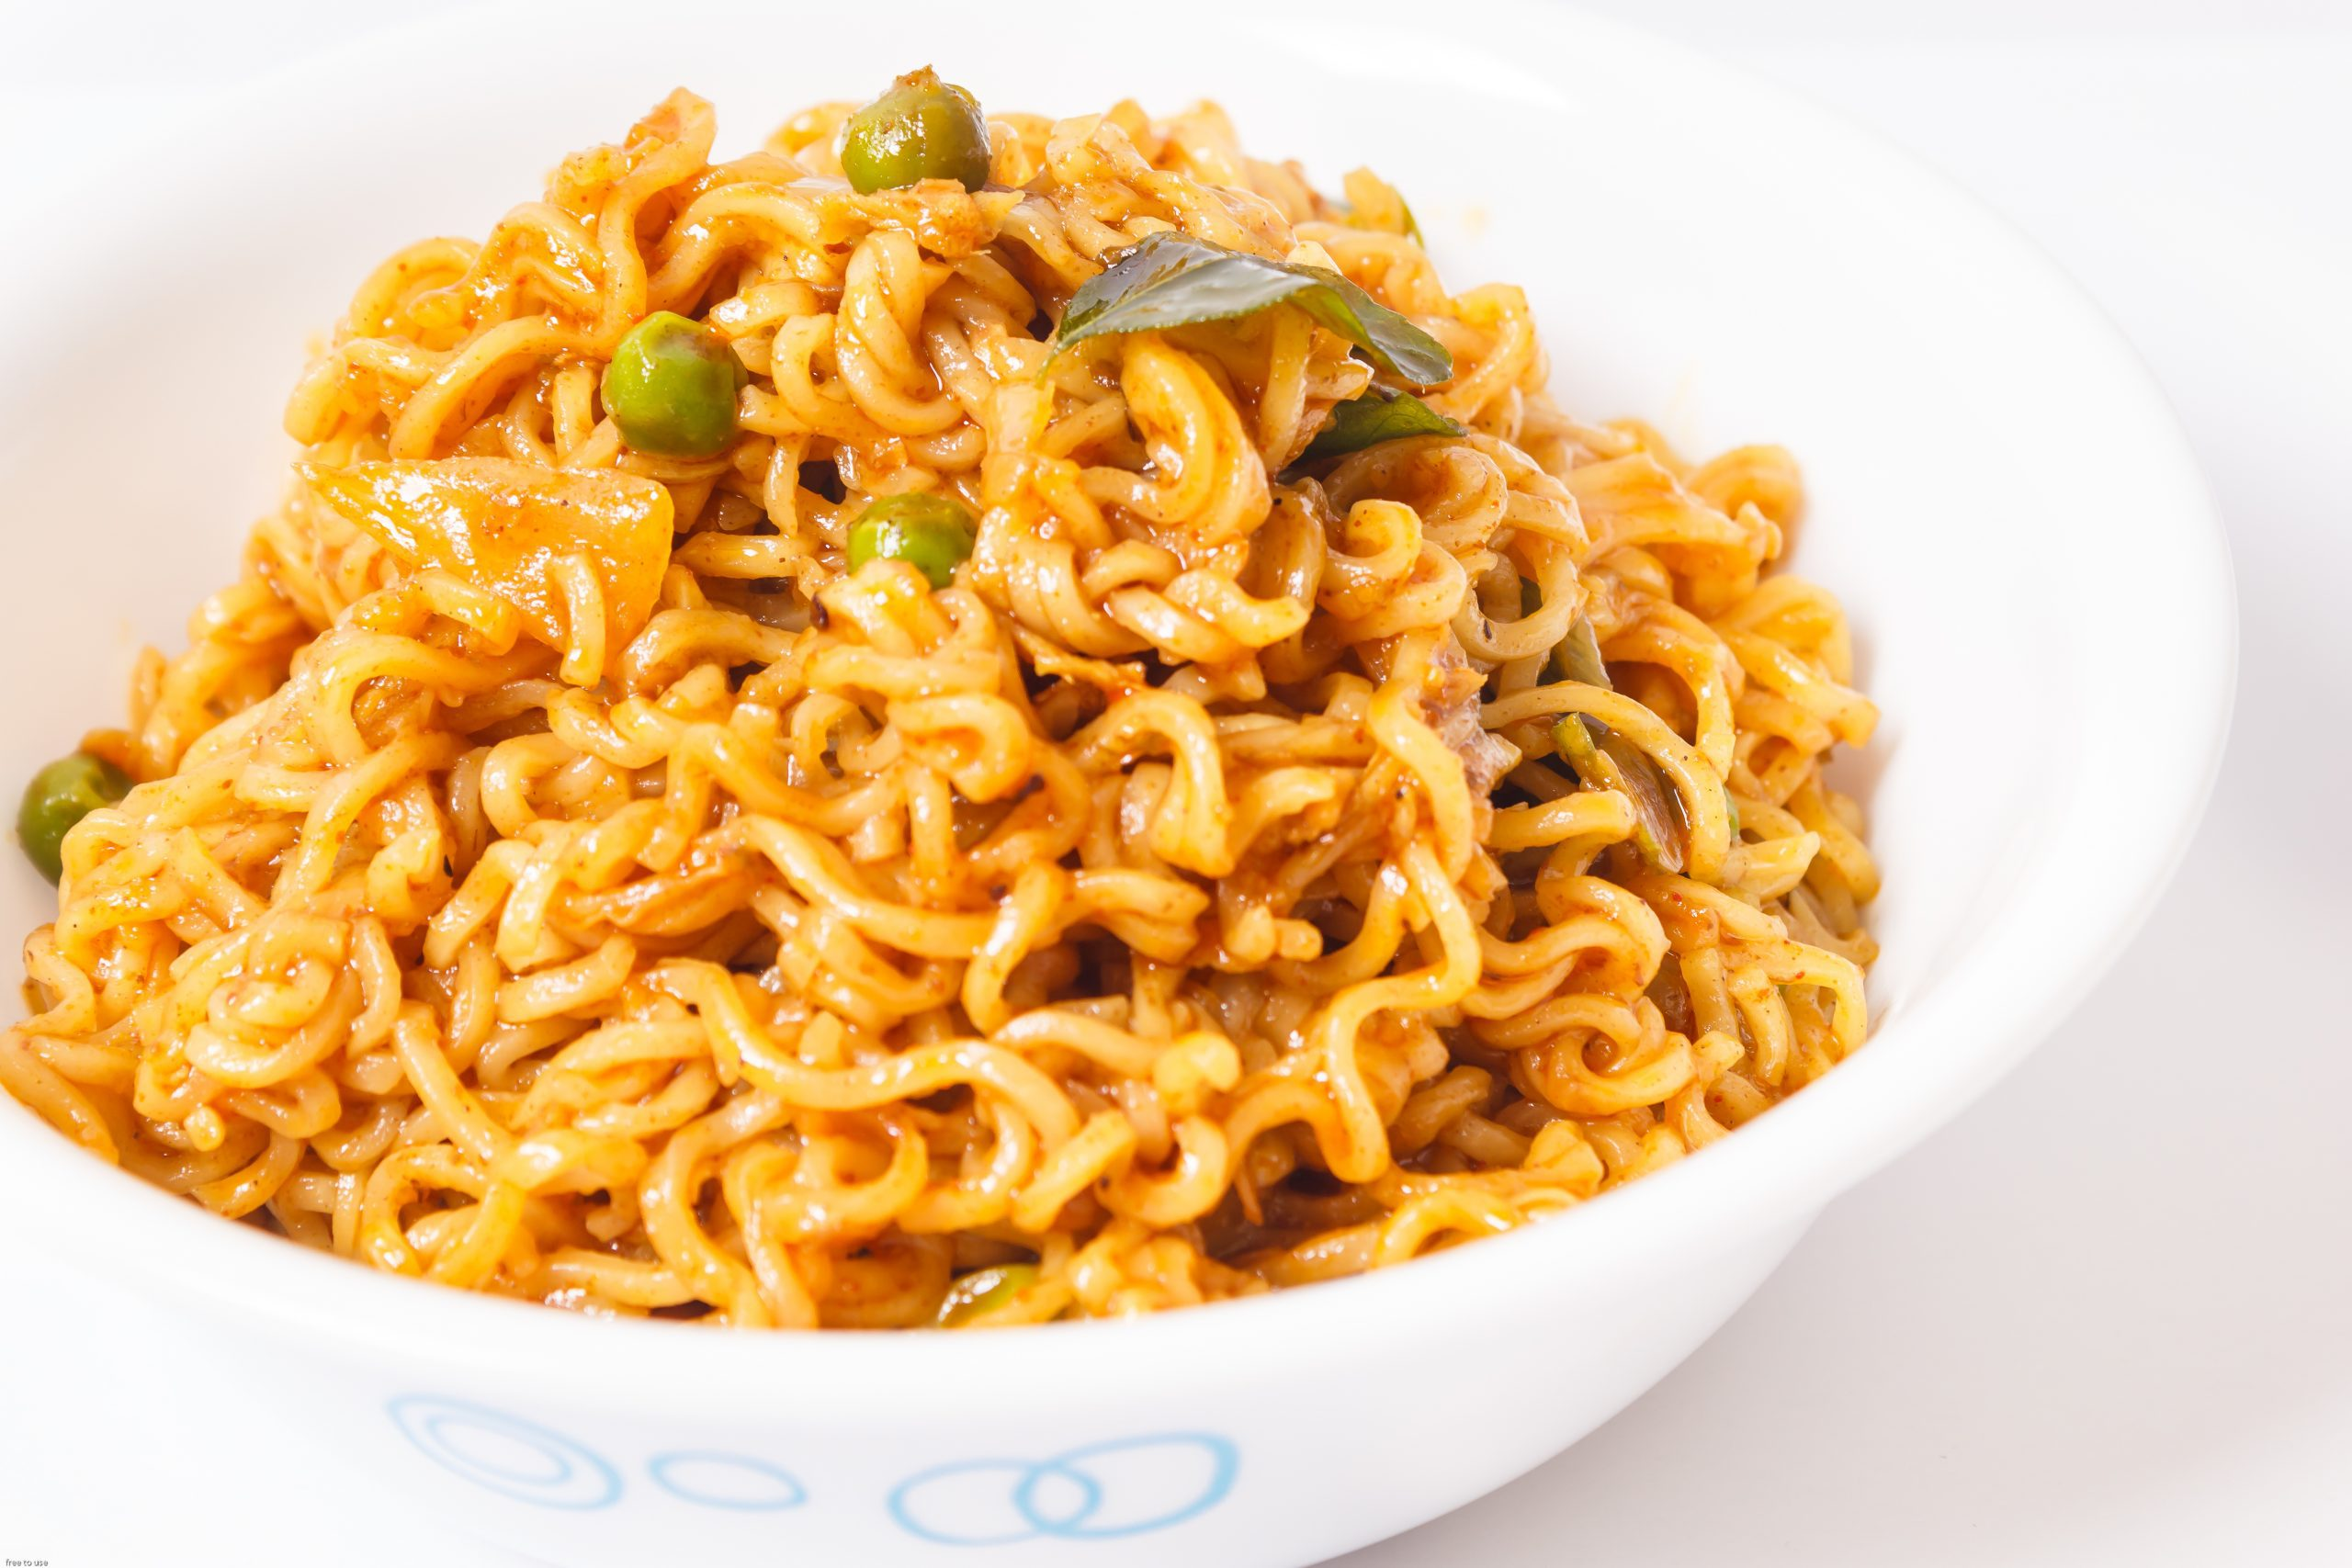 A bowl full of Masala noodles